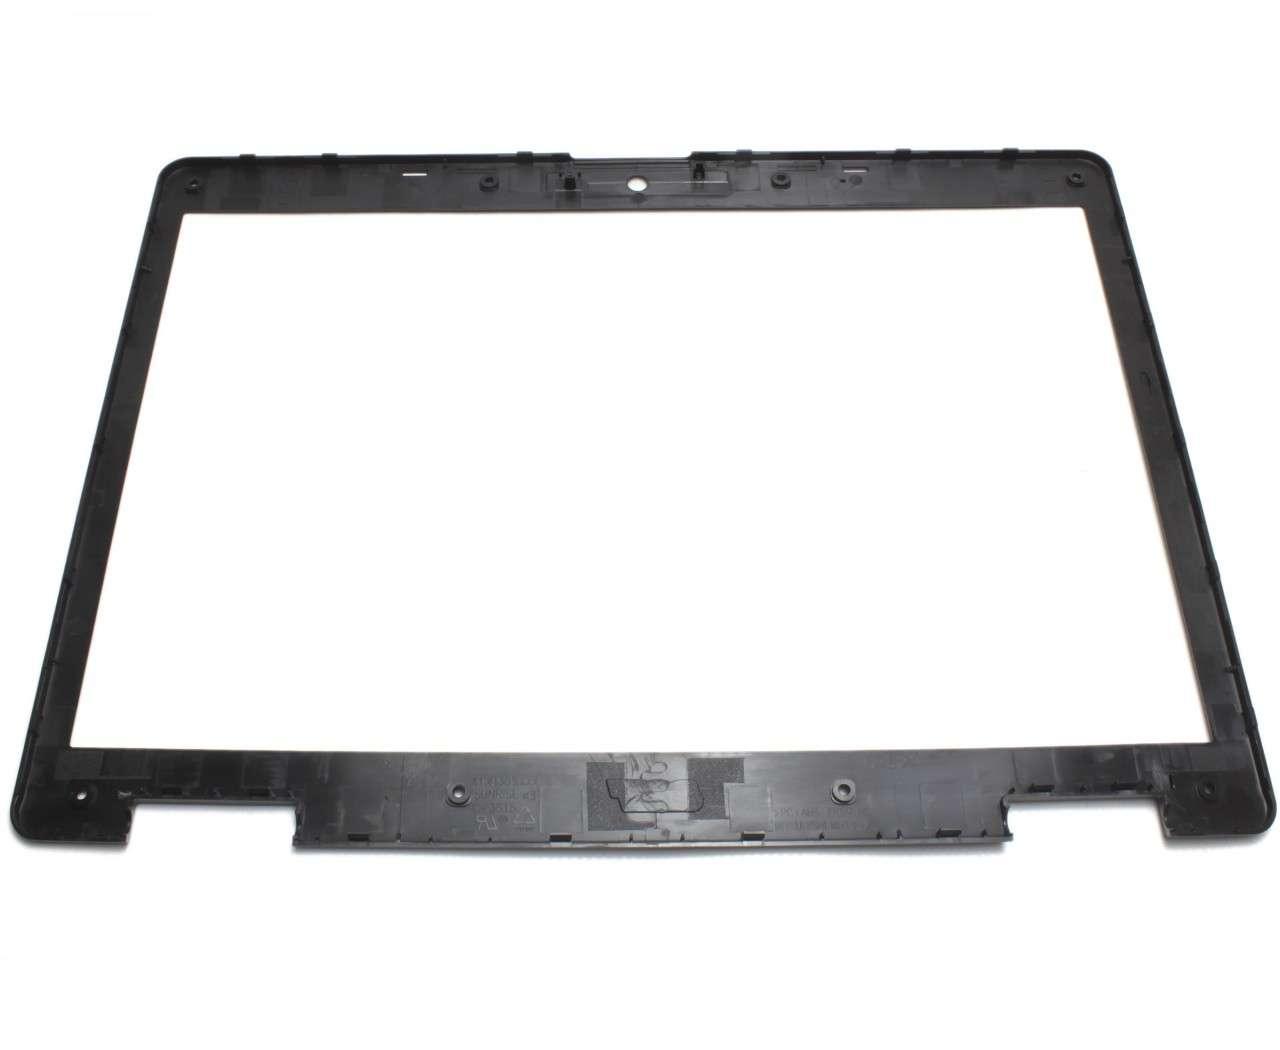 Rama Display Acer Extensa 5620 Bezel Front Cover Neagra imagine